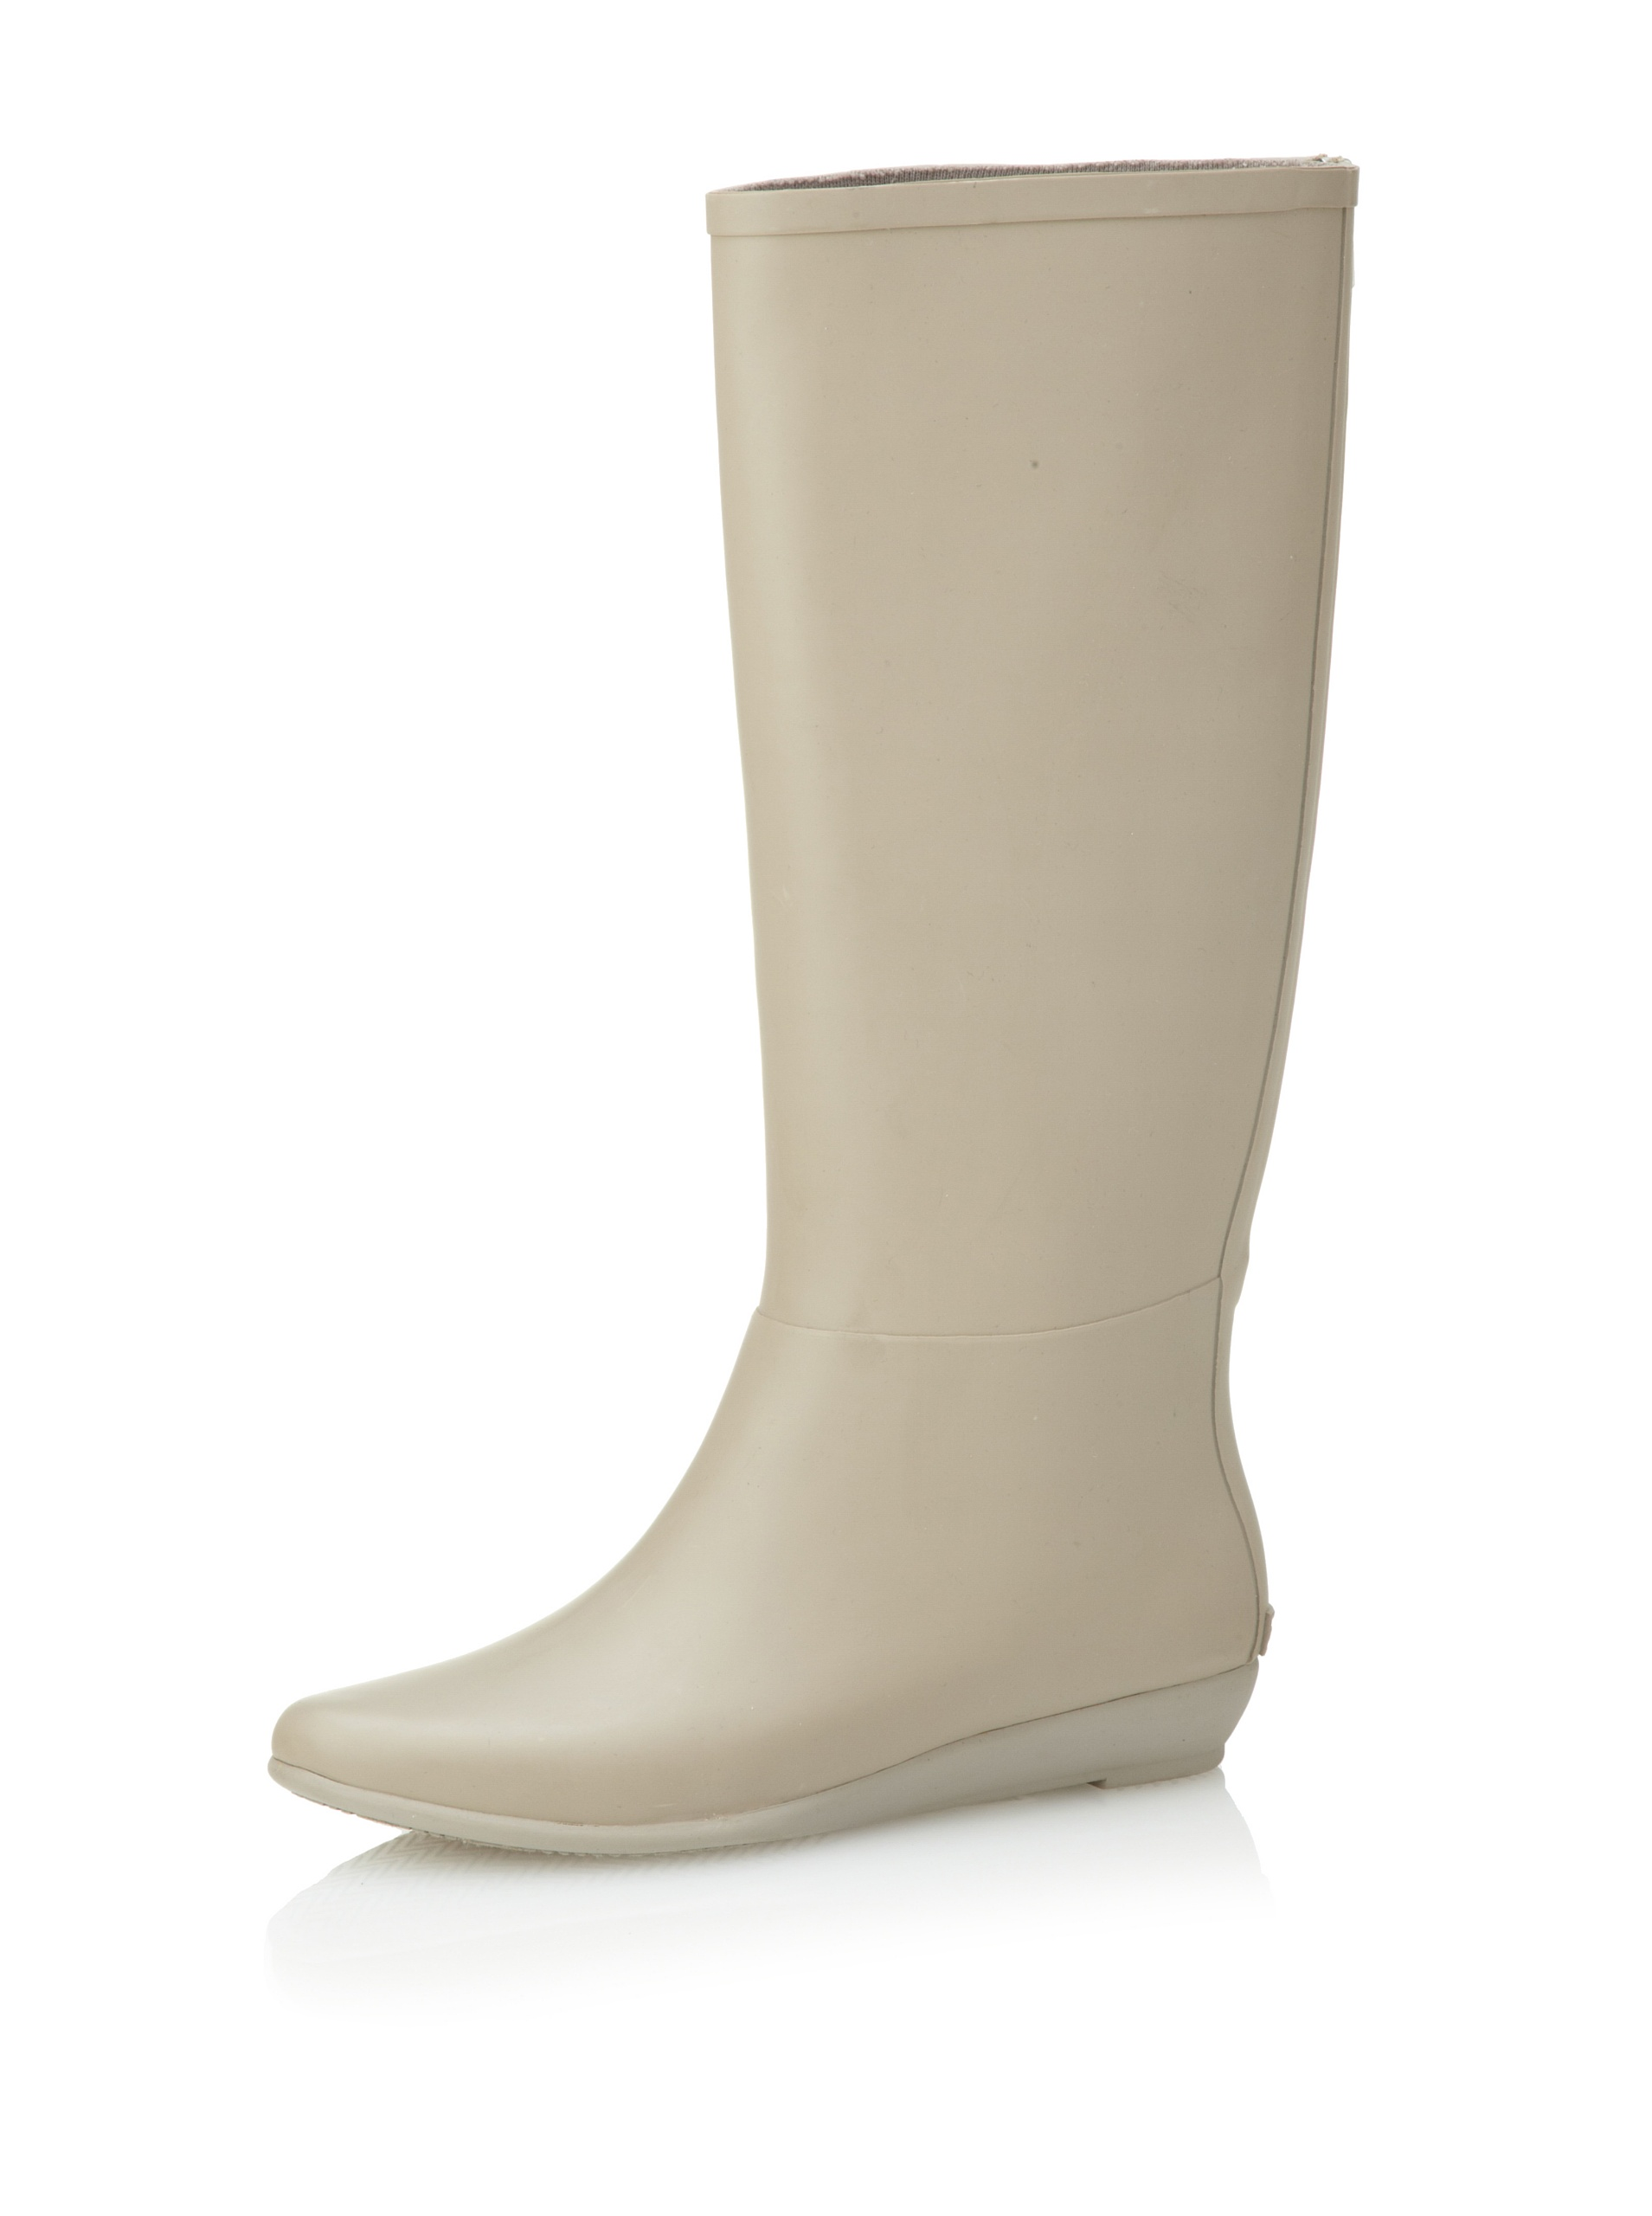 Loeffler Randall Women's LR Rain Boot (Taupe)